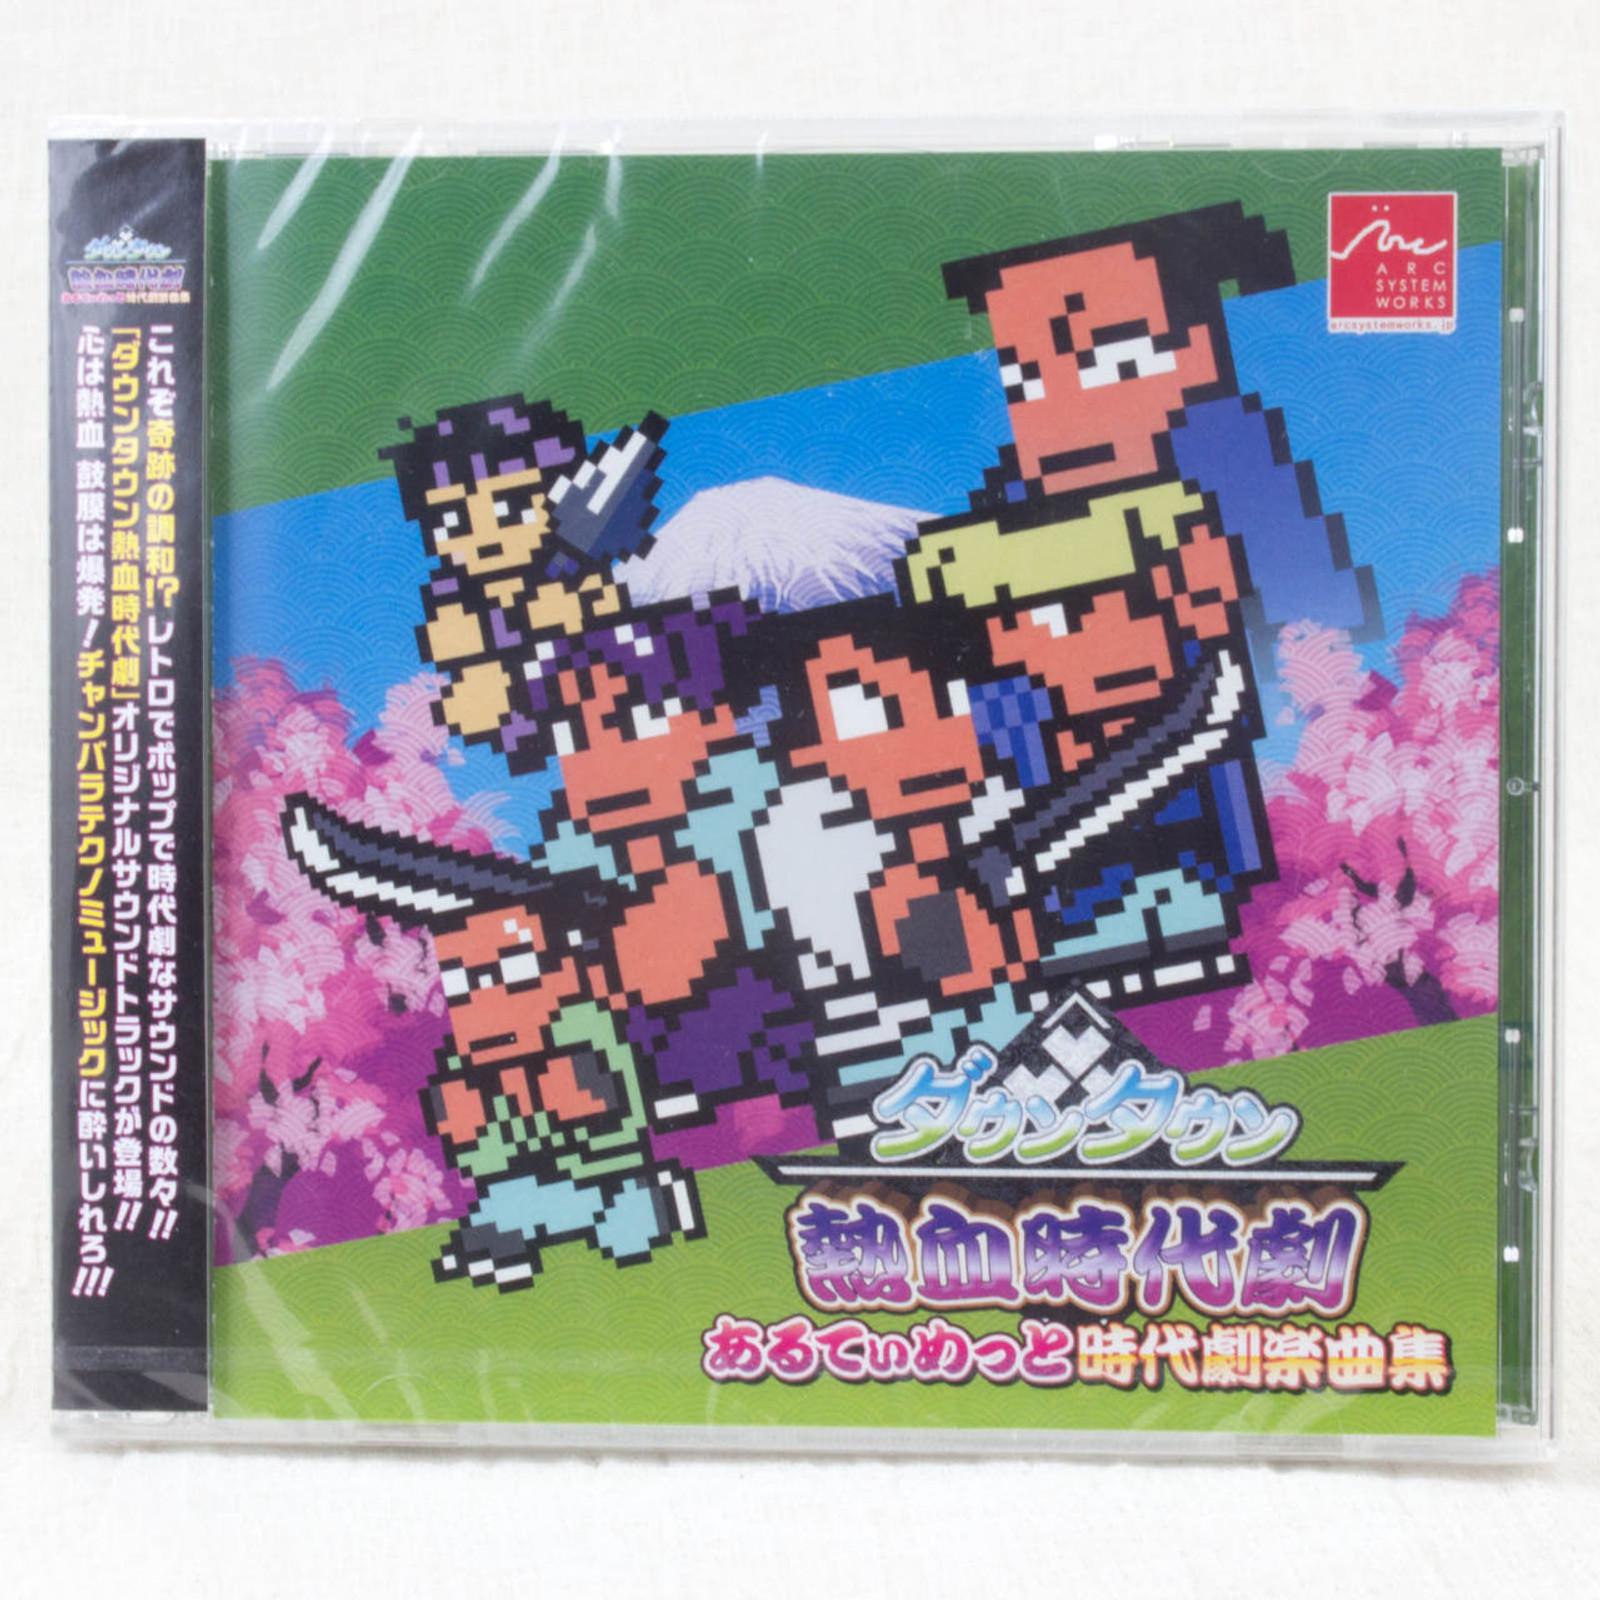 Down Town Nekketsu Jidaigeki Soundtrack CD Album JAPAN GAME